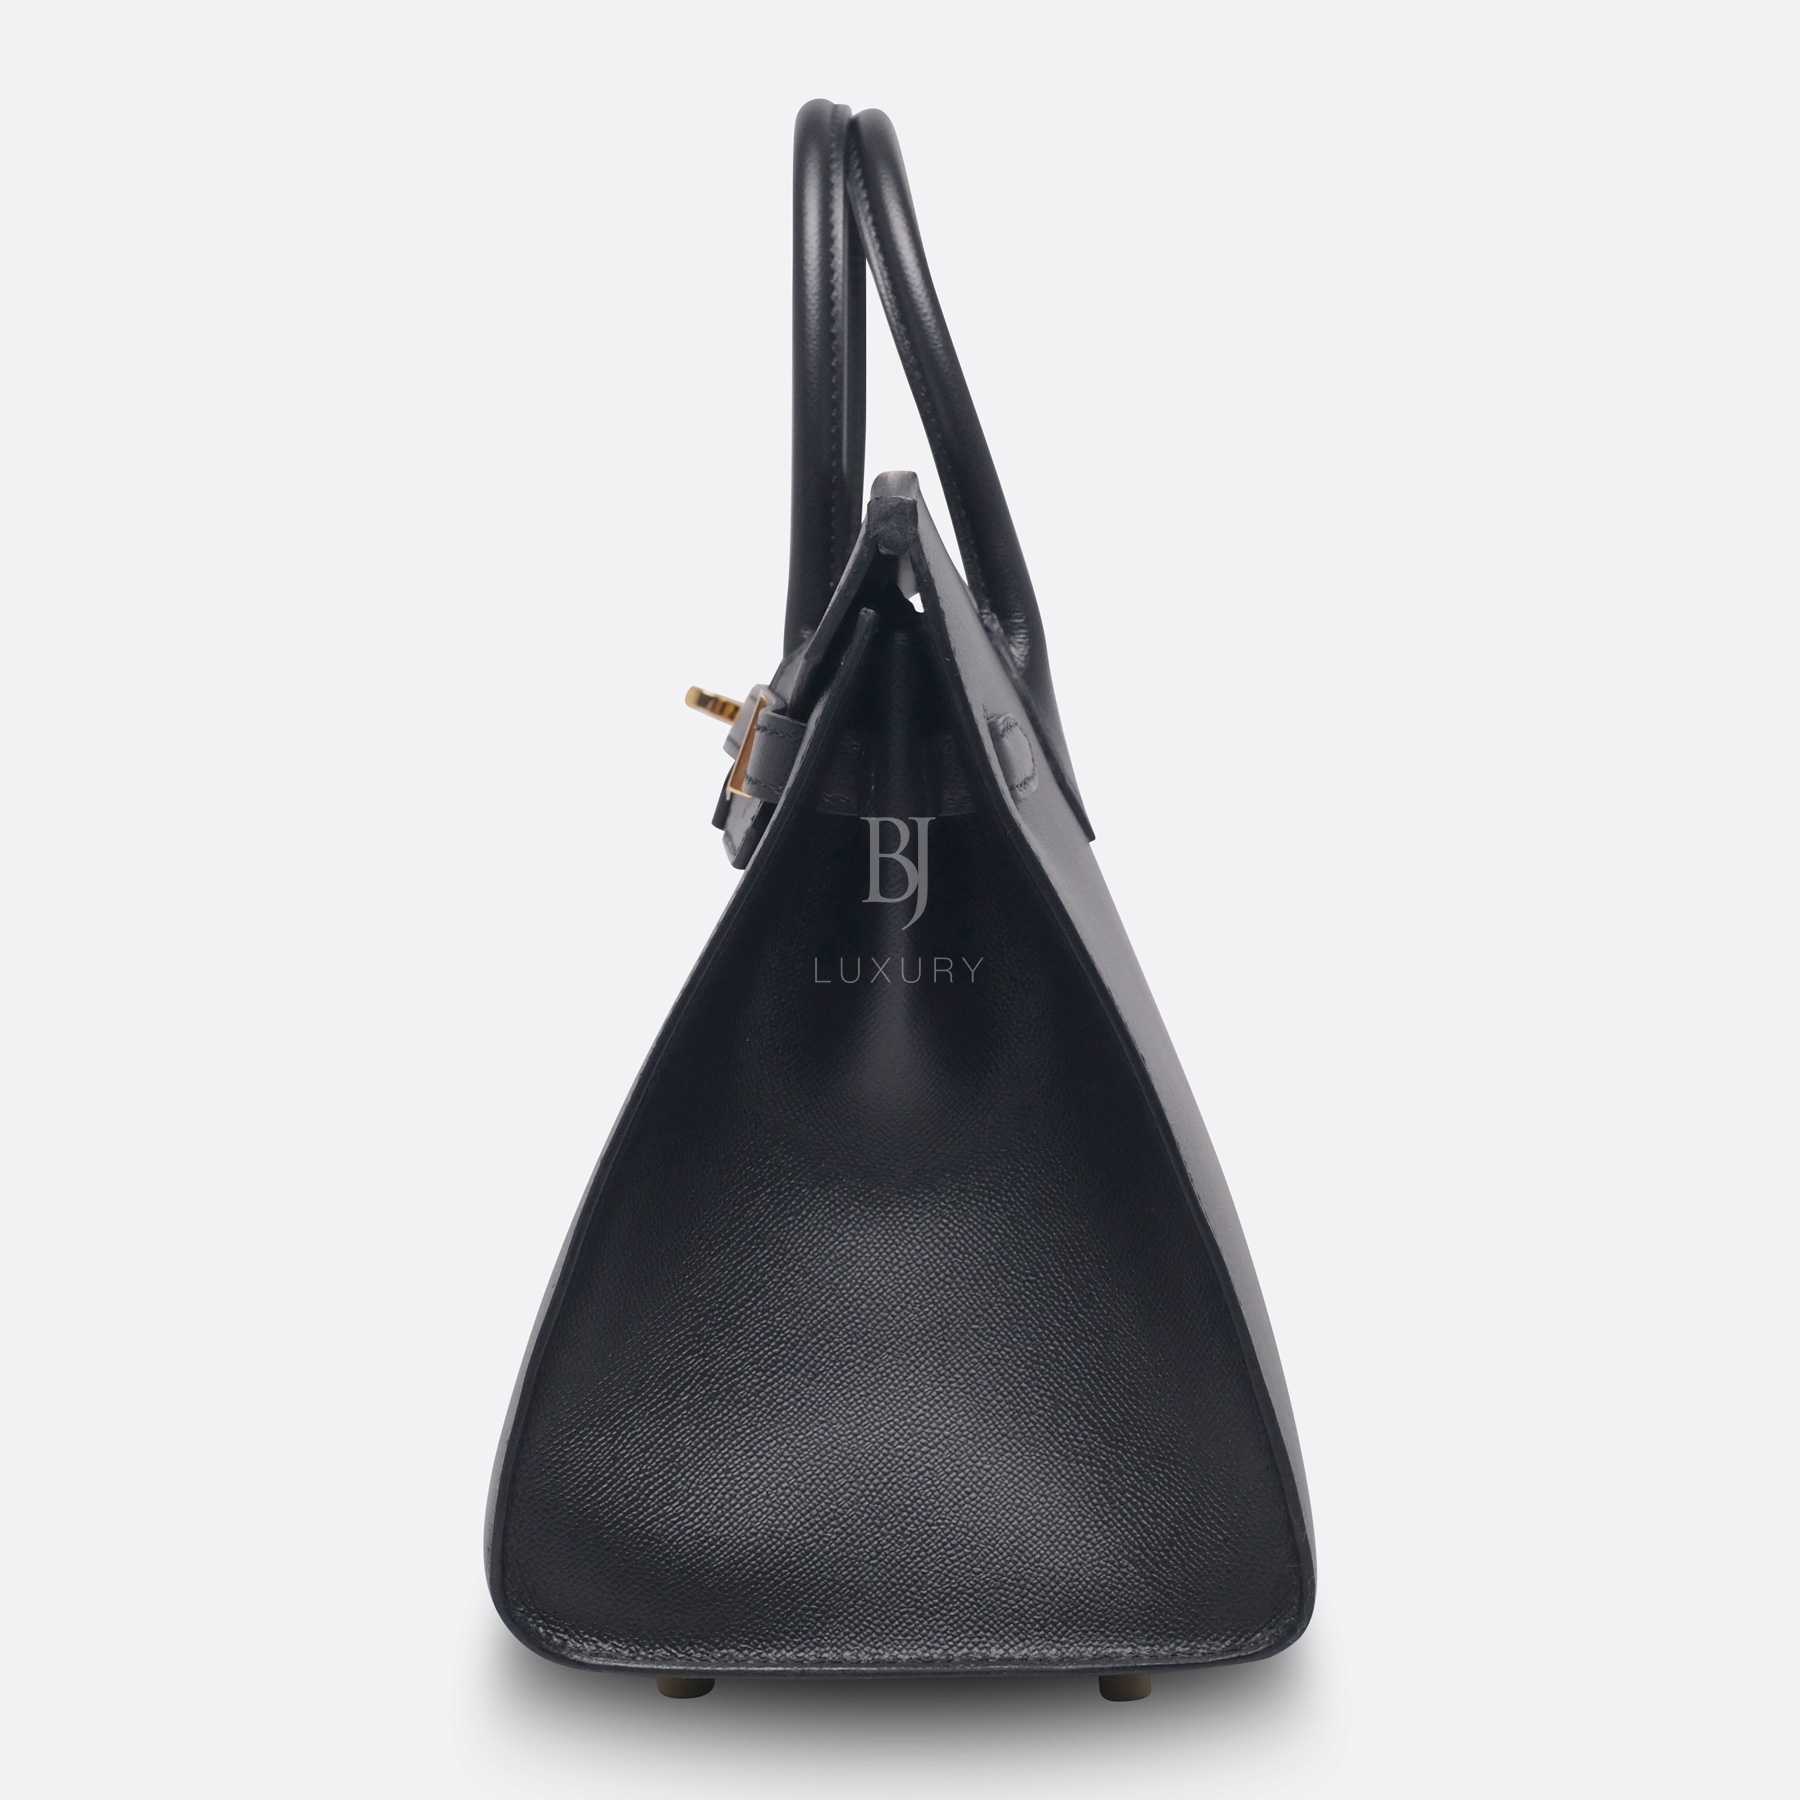 Birkin Sellier 25 Black Veau Madame Gold BJ Luxury 13.jpg